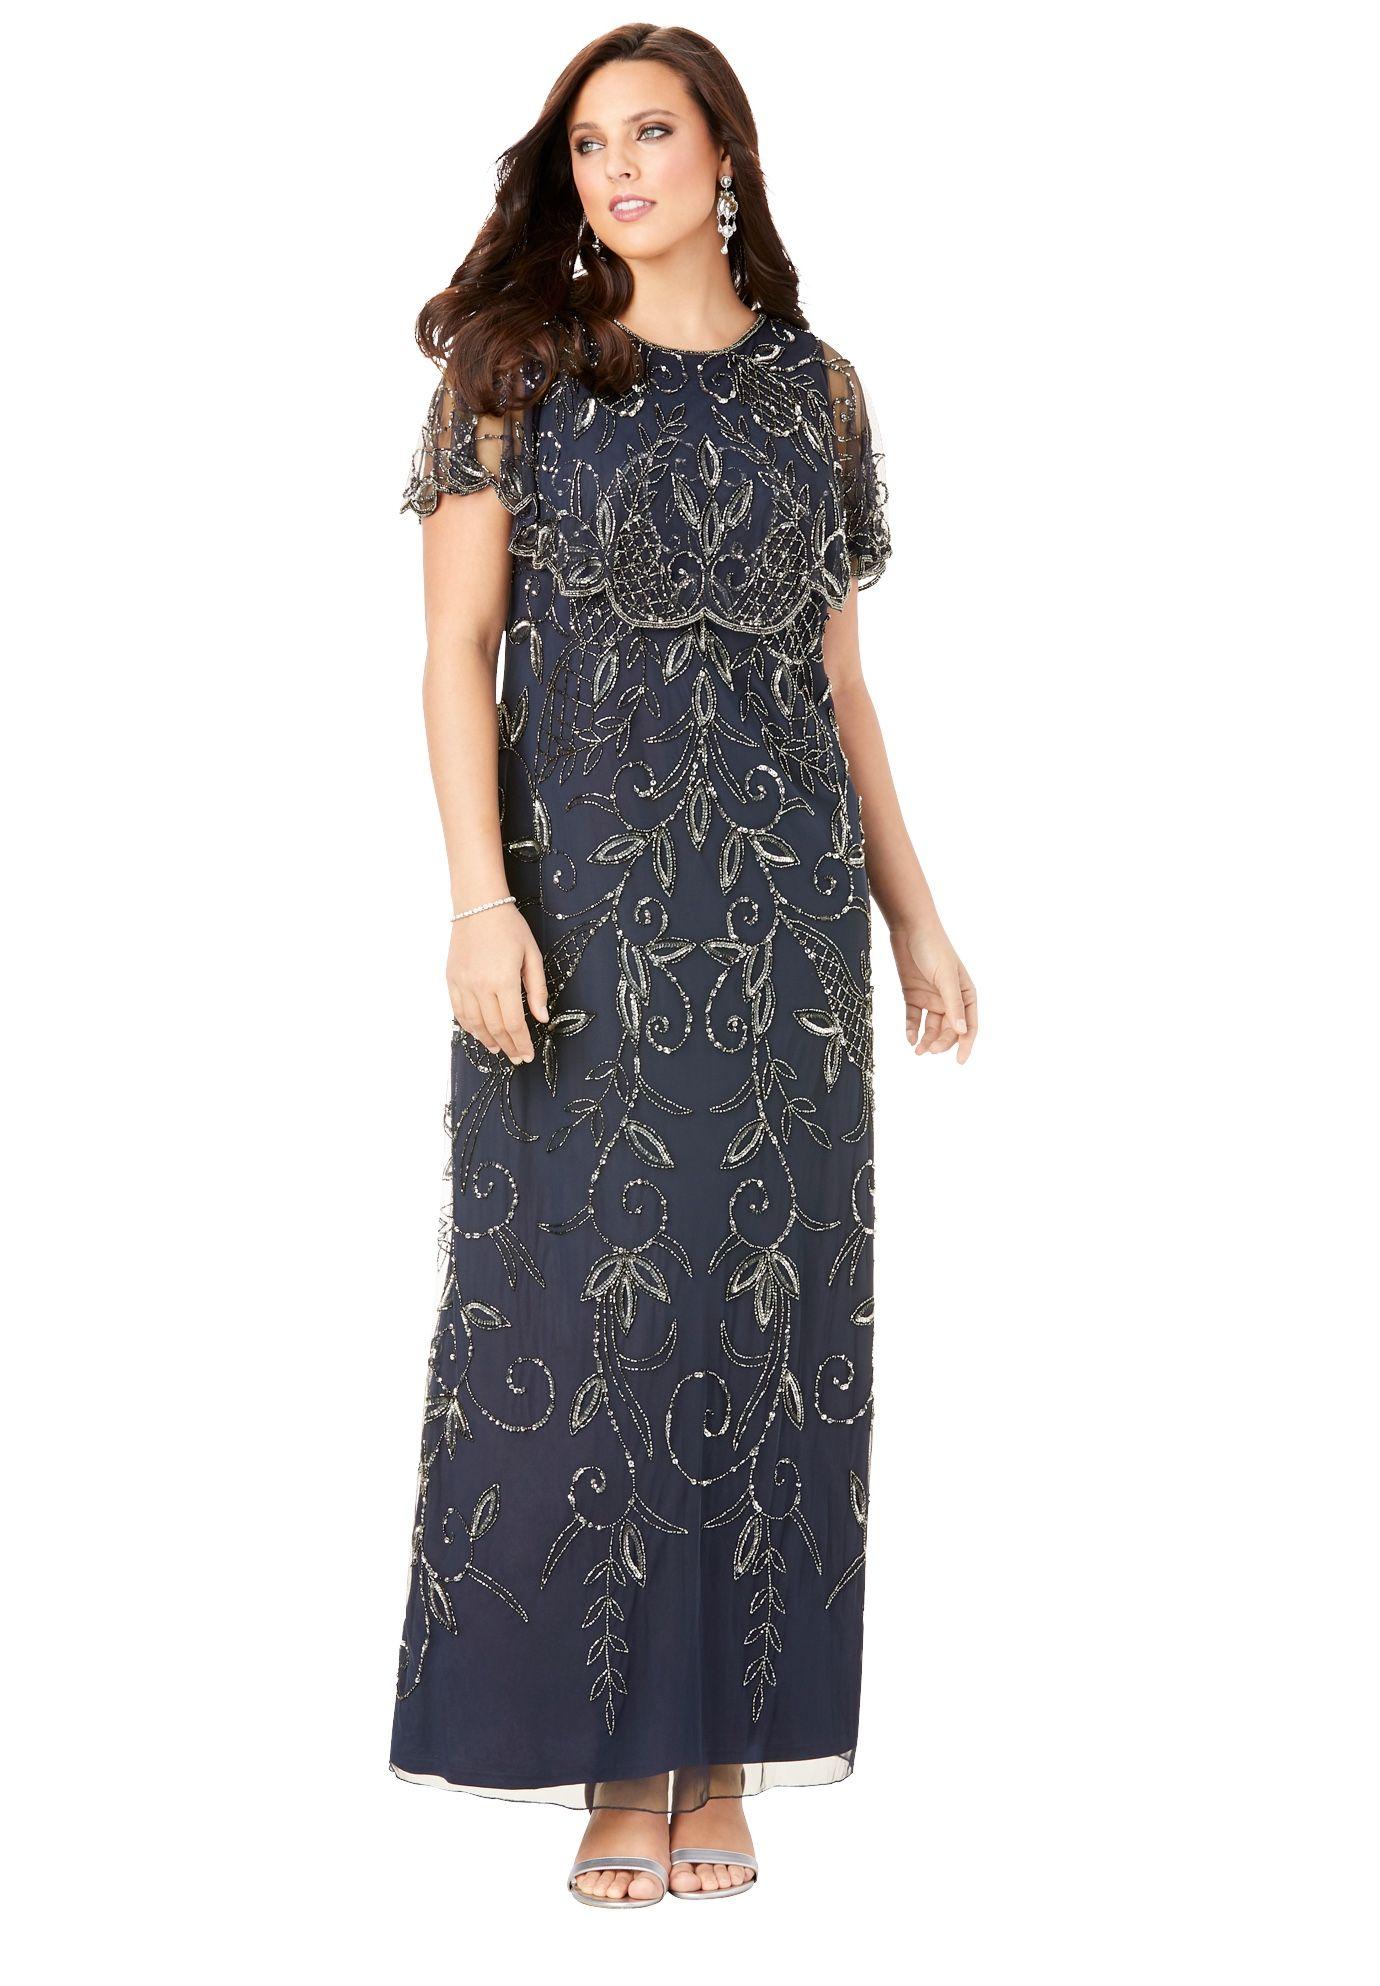 Roaman S Roaman S Women S Plus Size Glam Maxi Dress Beaded Formal Evening Capelet Gown Walmart Com In 2021 Glam Maxi Dress Plus Size Maxi Dresses Fashionable Plus Size Clothing [ 1986 x 1380 Pixel ]